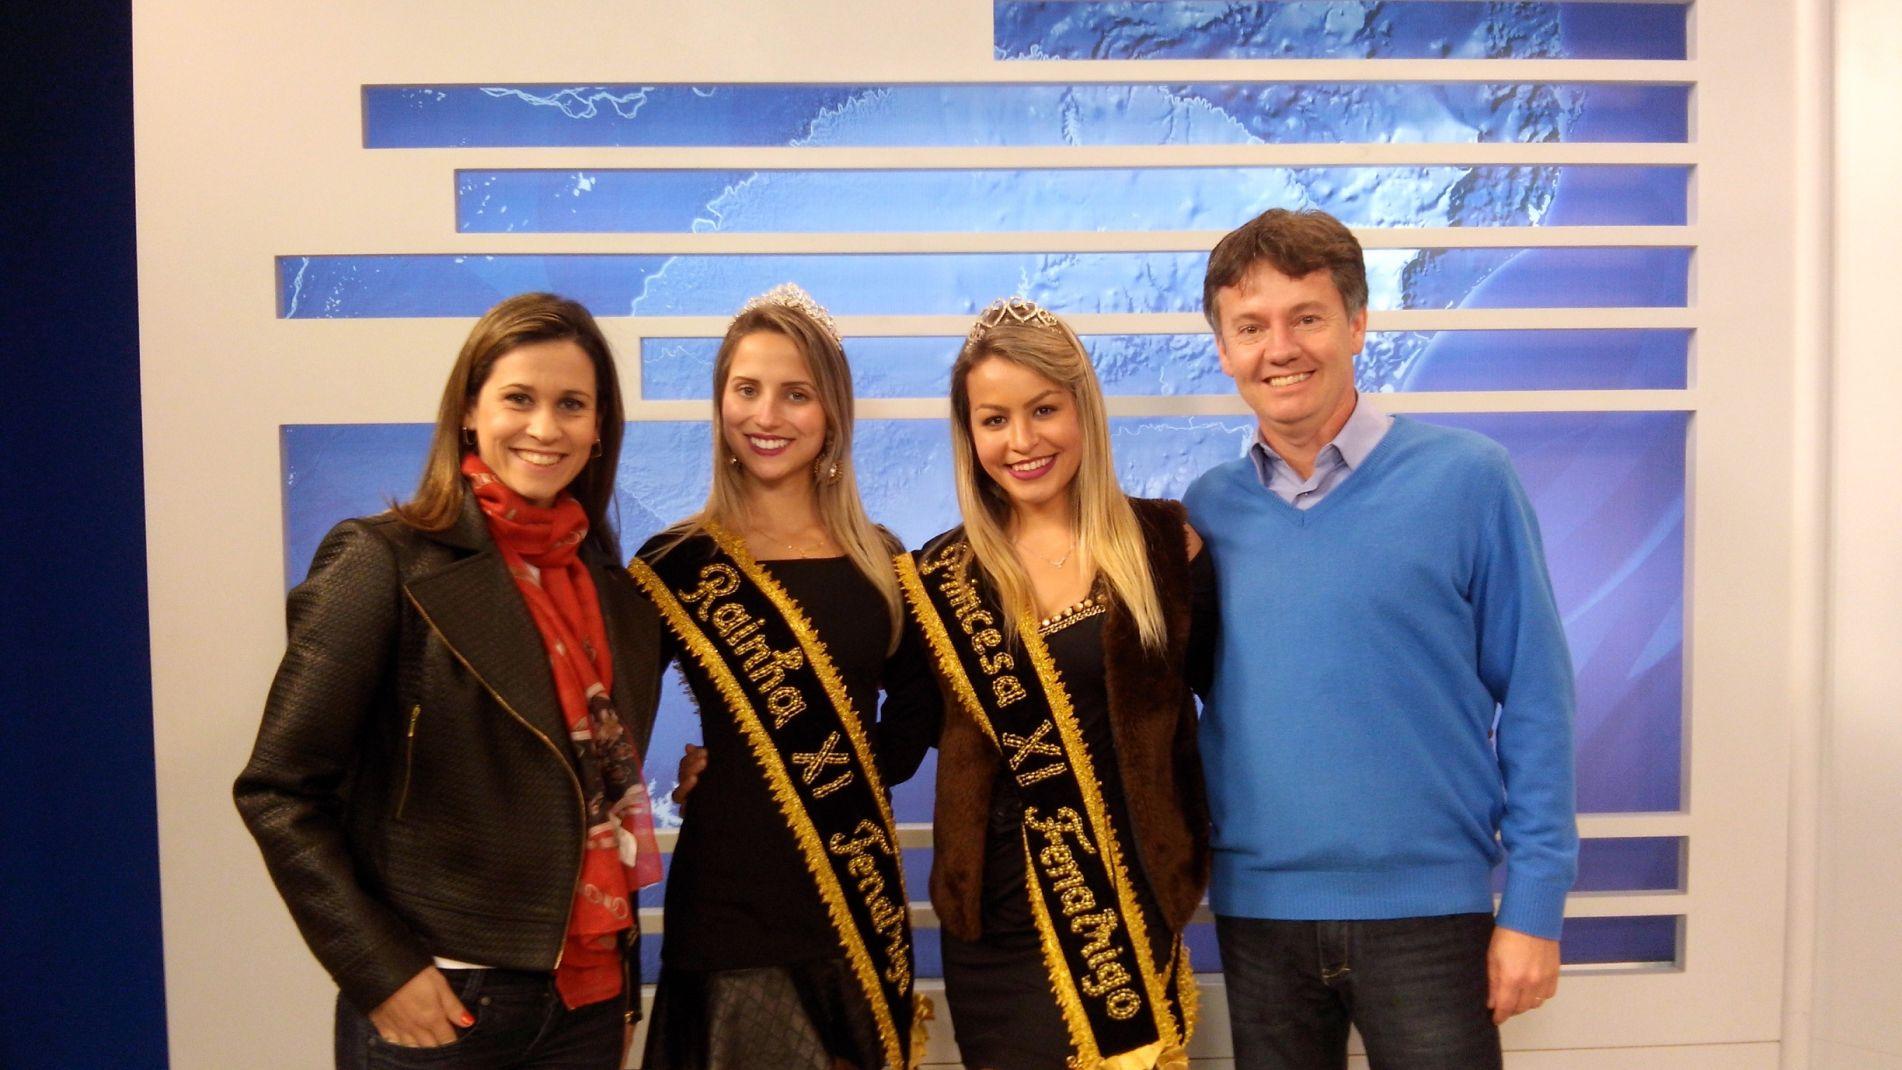 Presidente e soberanas com Anelise Nicolodi na RBS TV